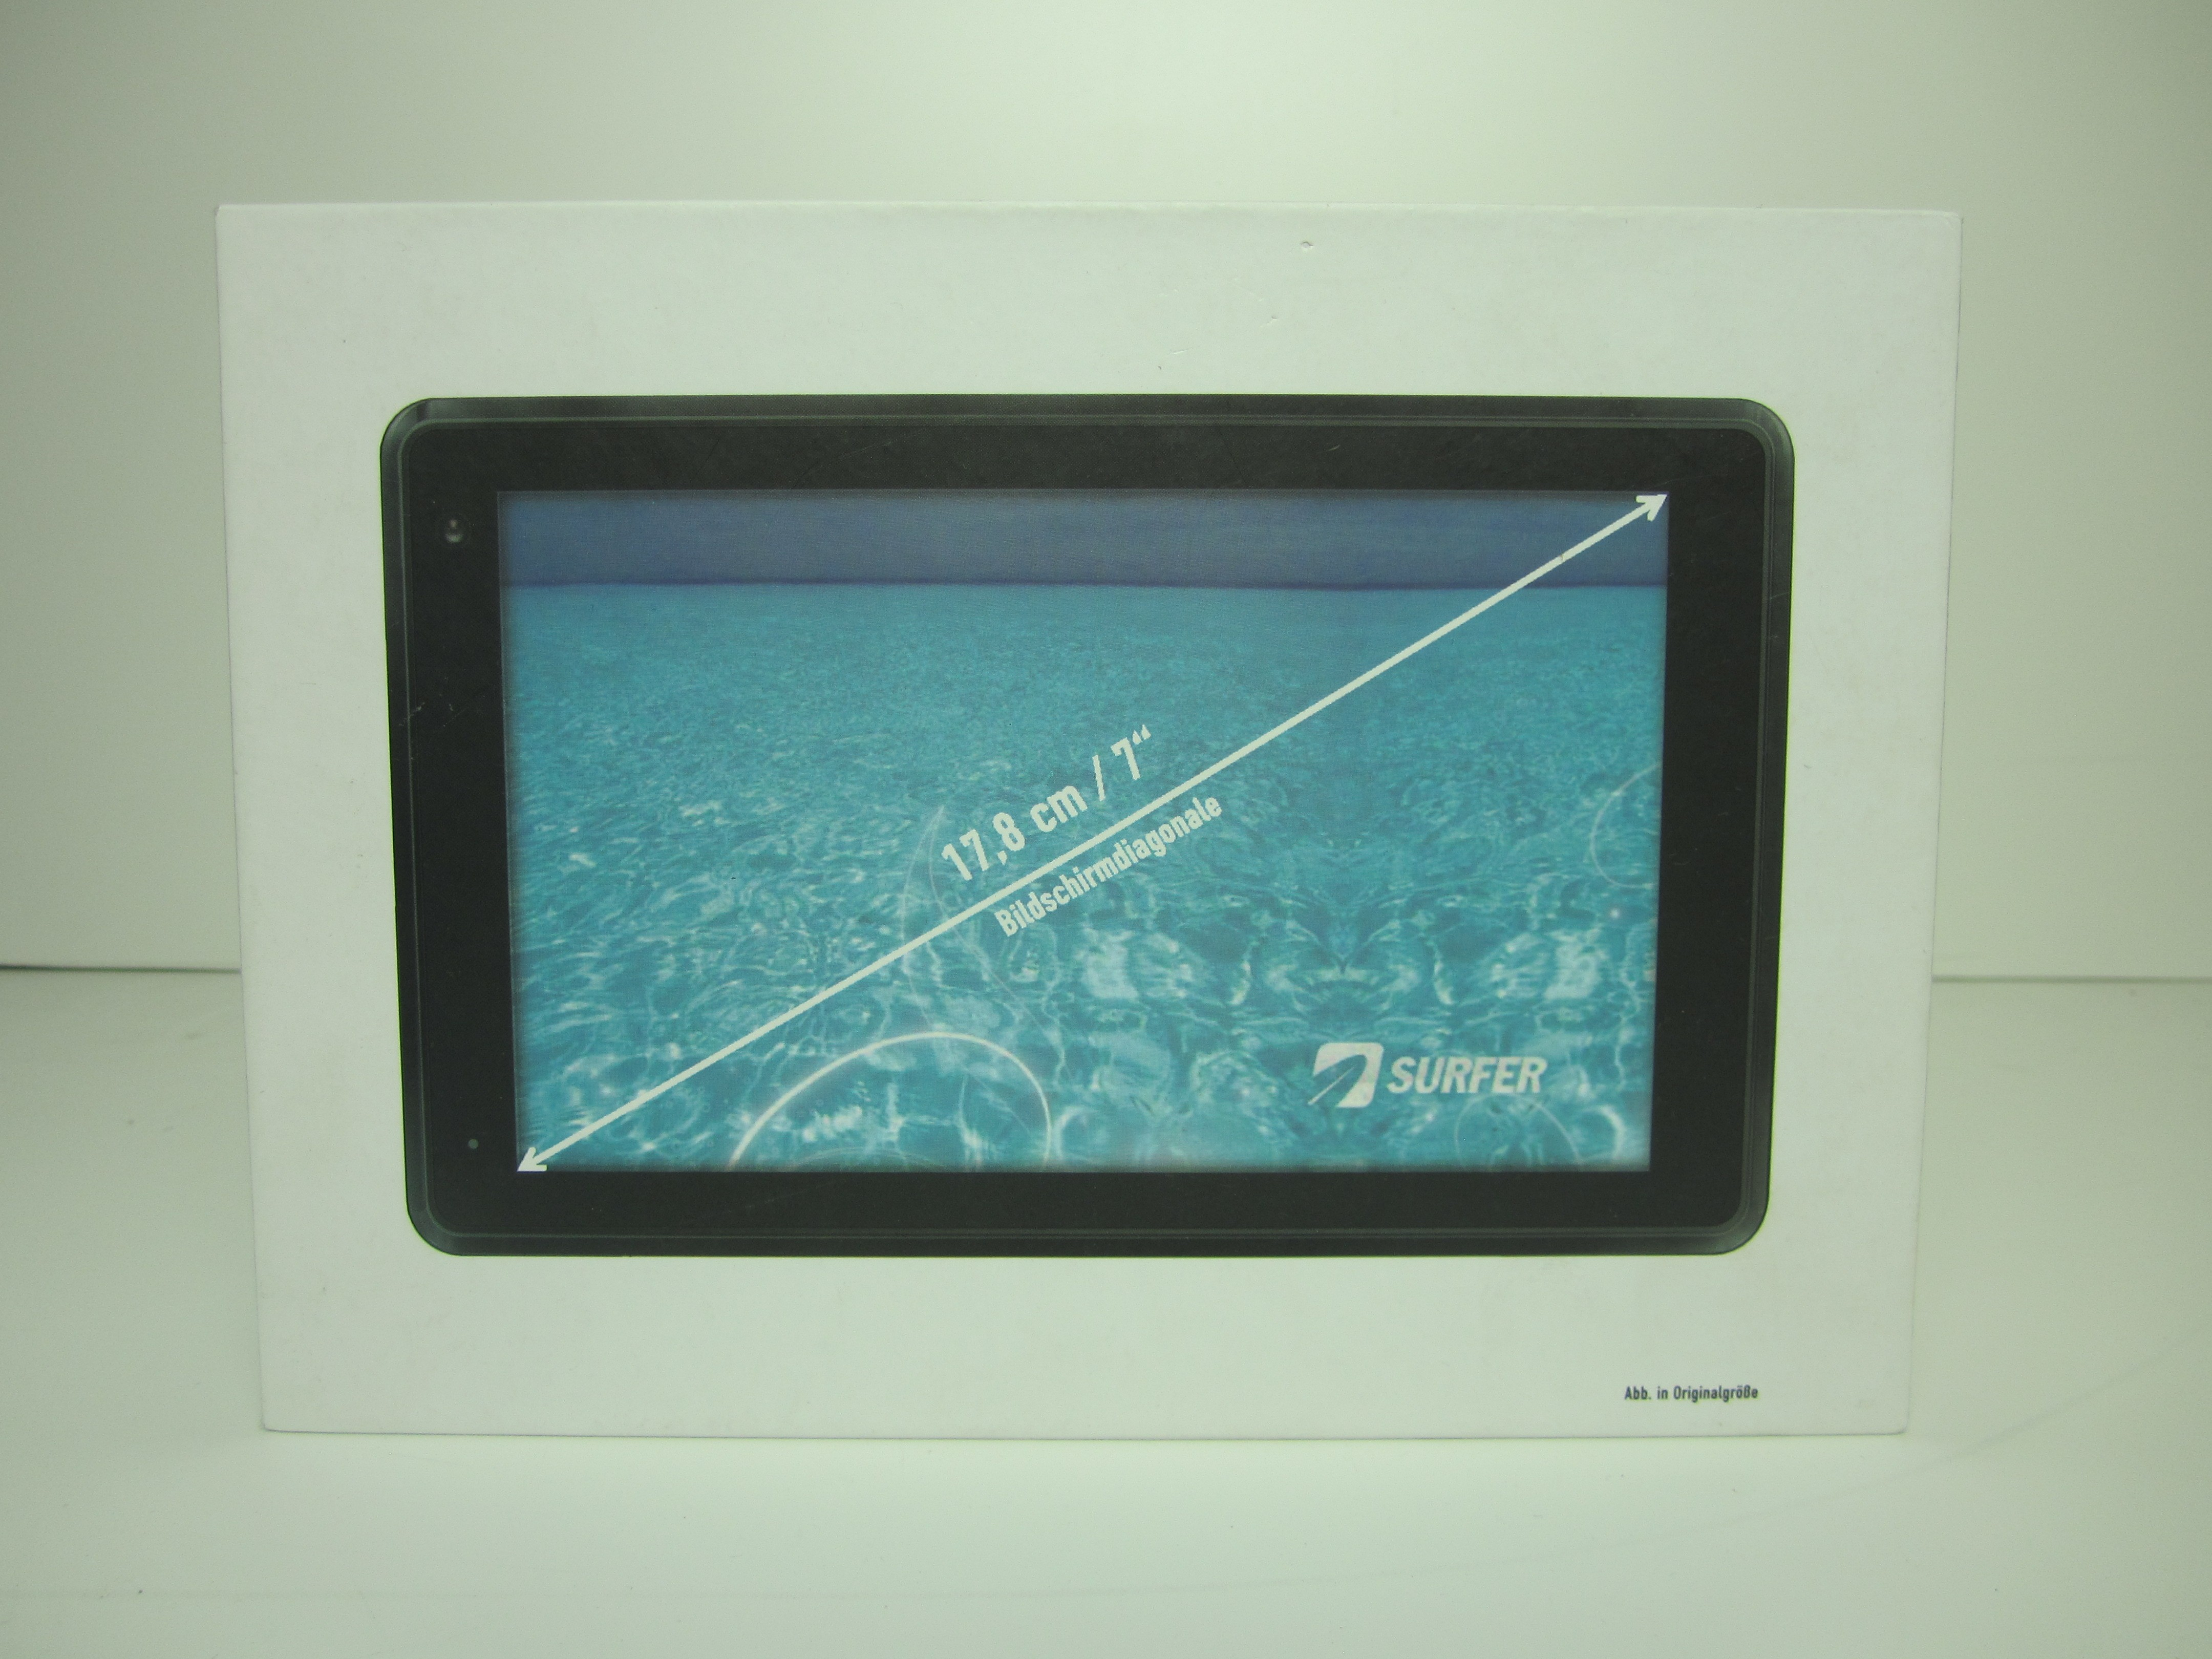 tablette tactile 7 39 39 17 8 cm reconditionn e surfer rec1 miniplanes. Black Bedroom Furniture Sets. Home Design Ideas